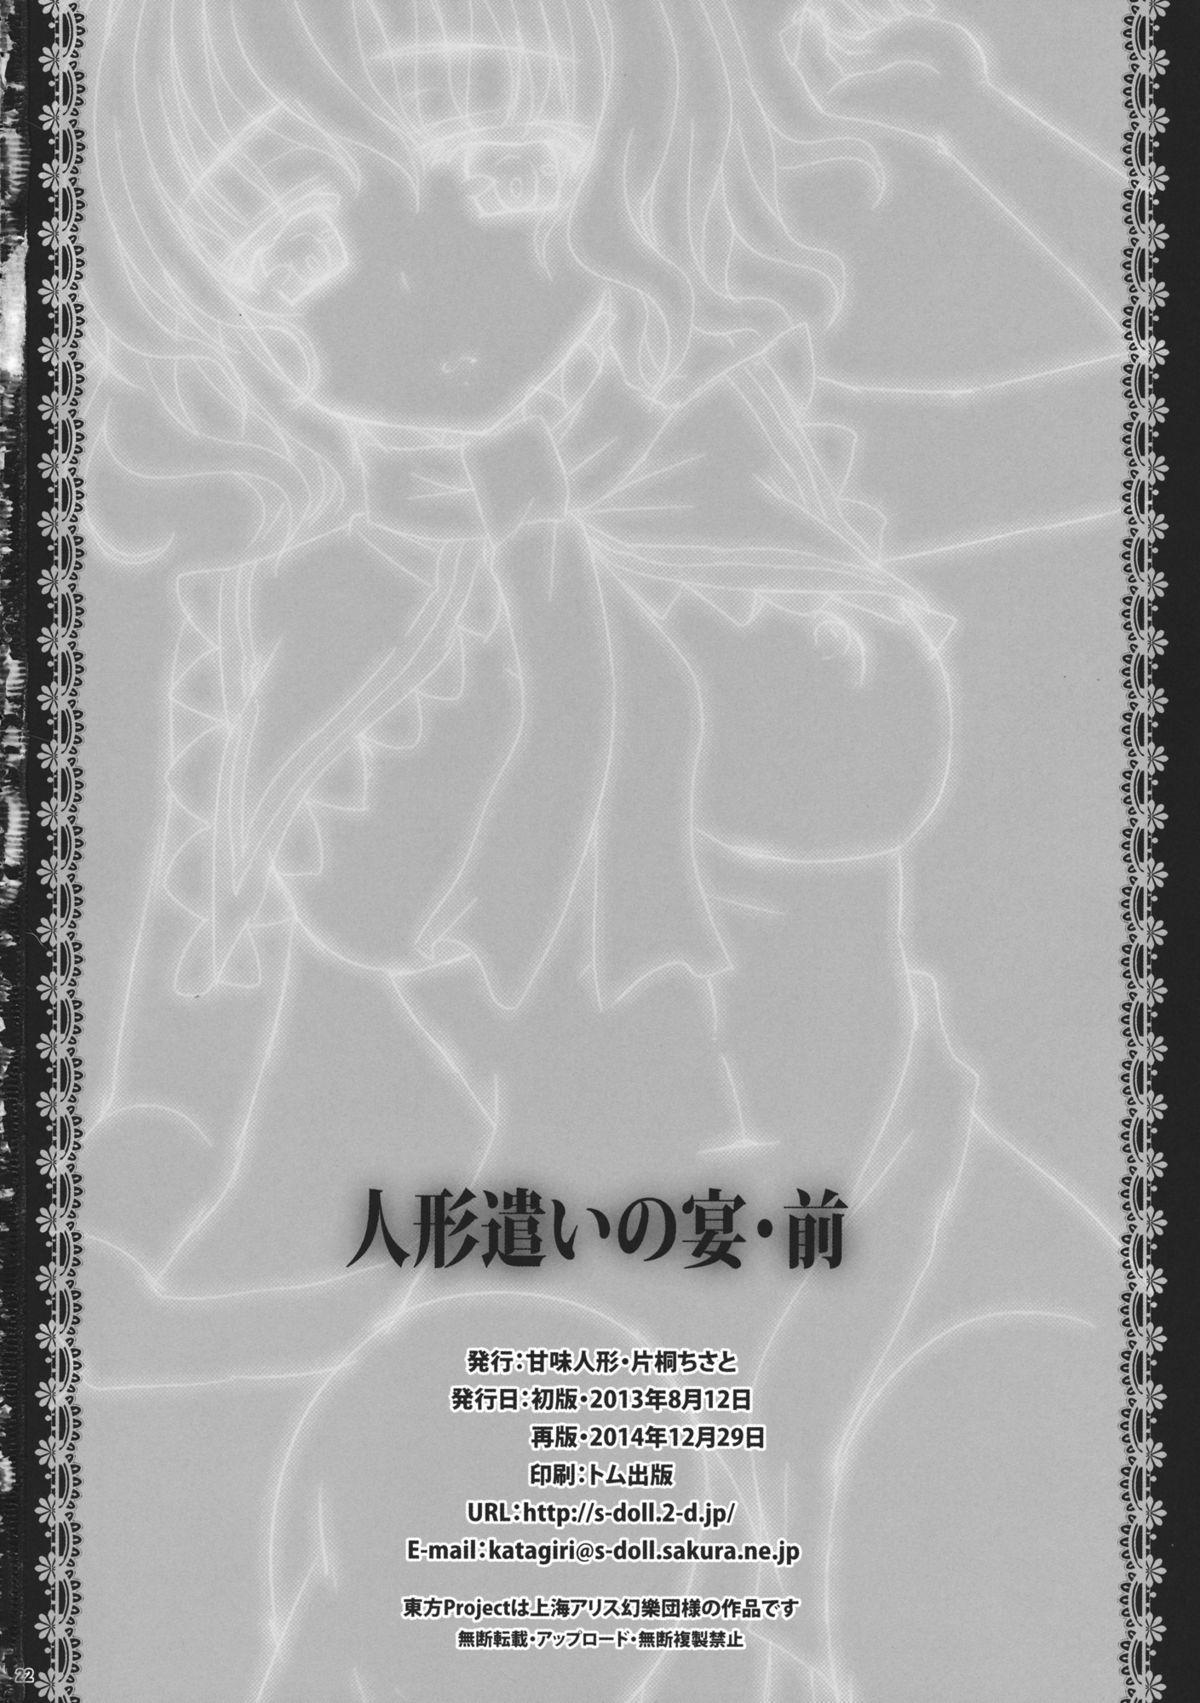 Ningyoutsukai no Utage Zen 20